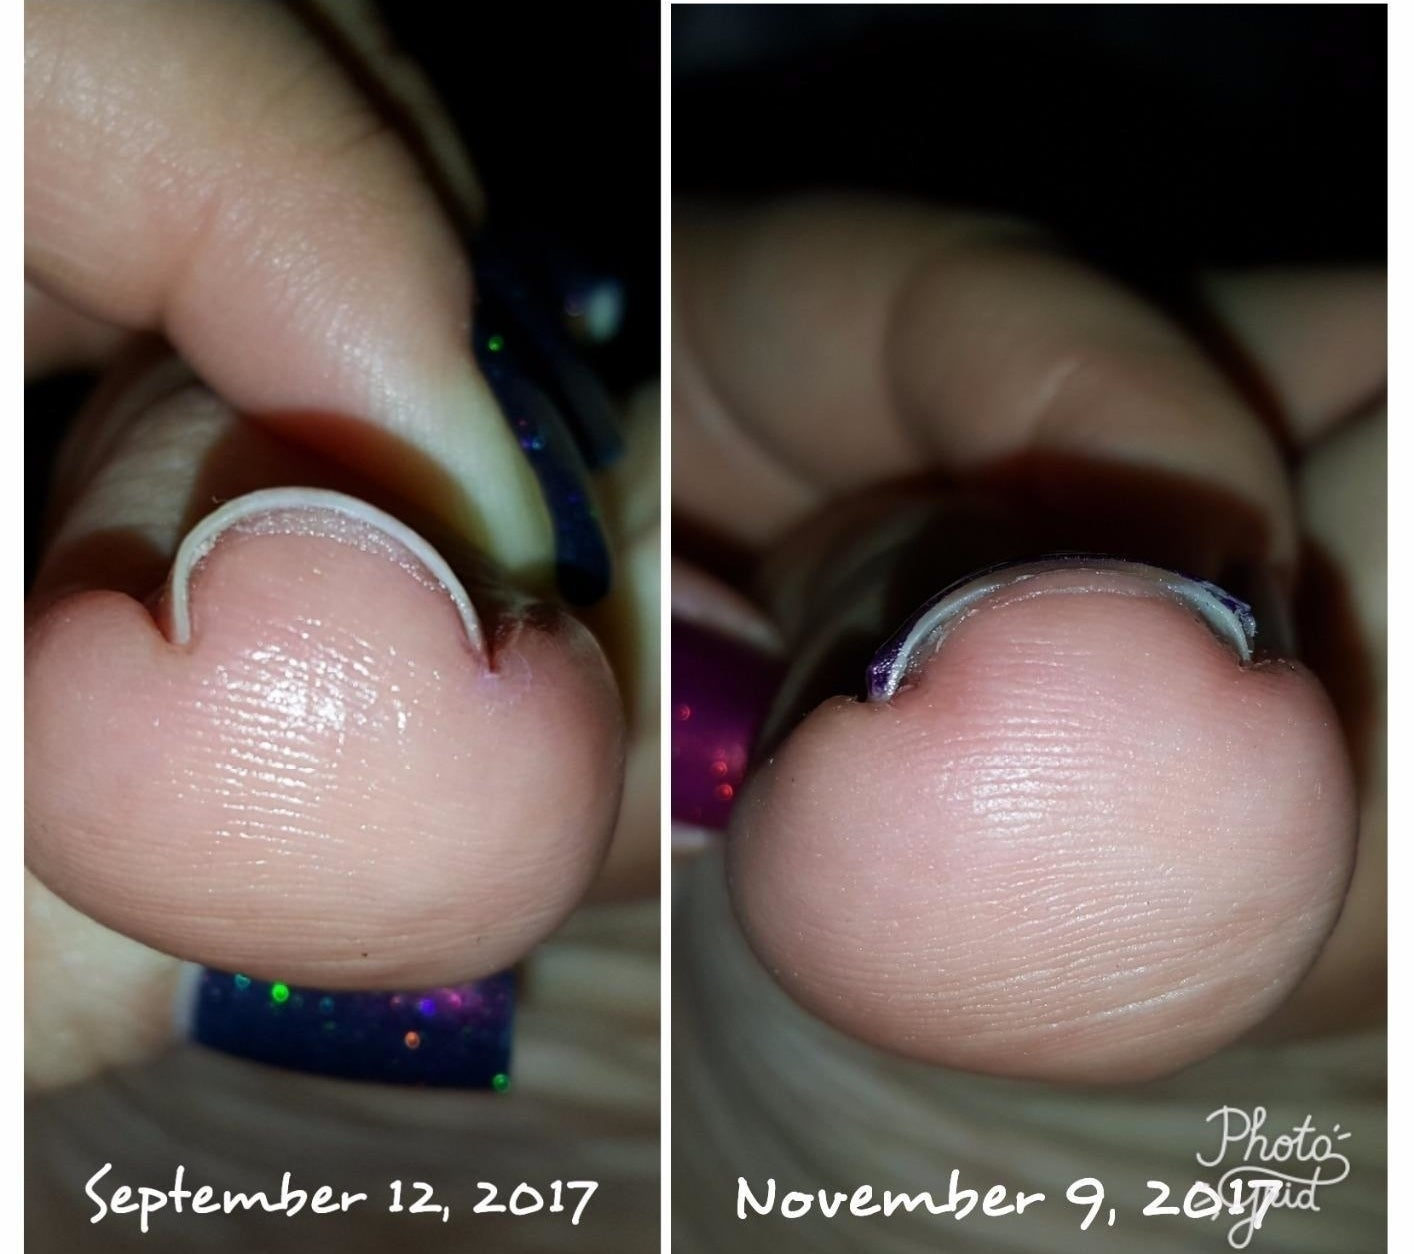 On the left: a reviewer's ingrown toenail on September 12, 2017; on the right: the toenail much much, much less ingrown on November 9, 2017